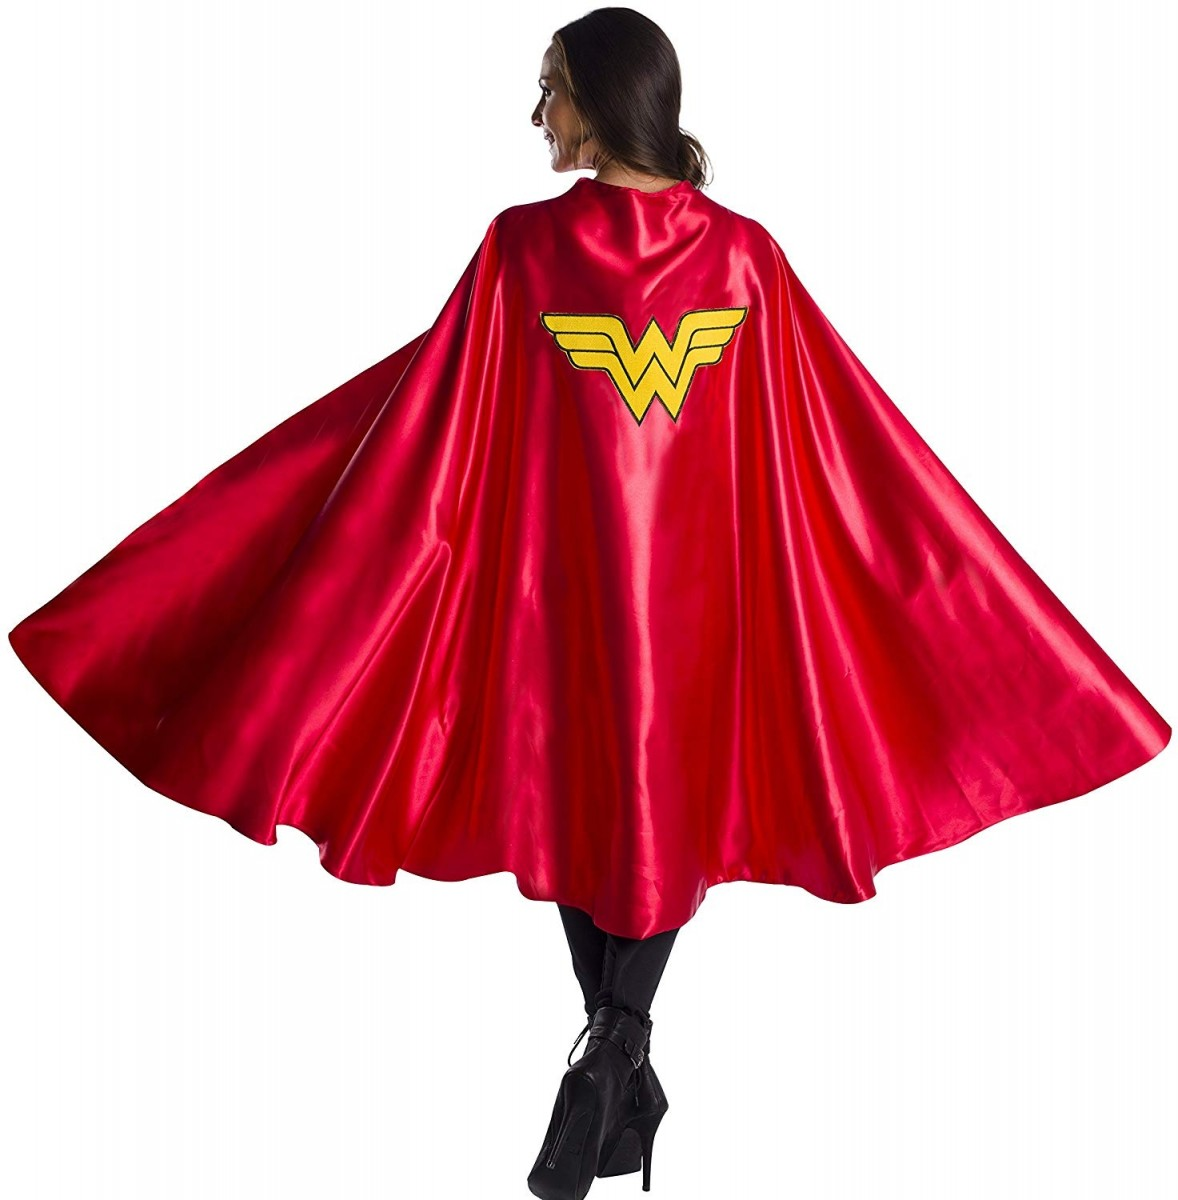 Red General Fairy Tales or Superhero Fantasy Costume Cape